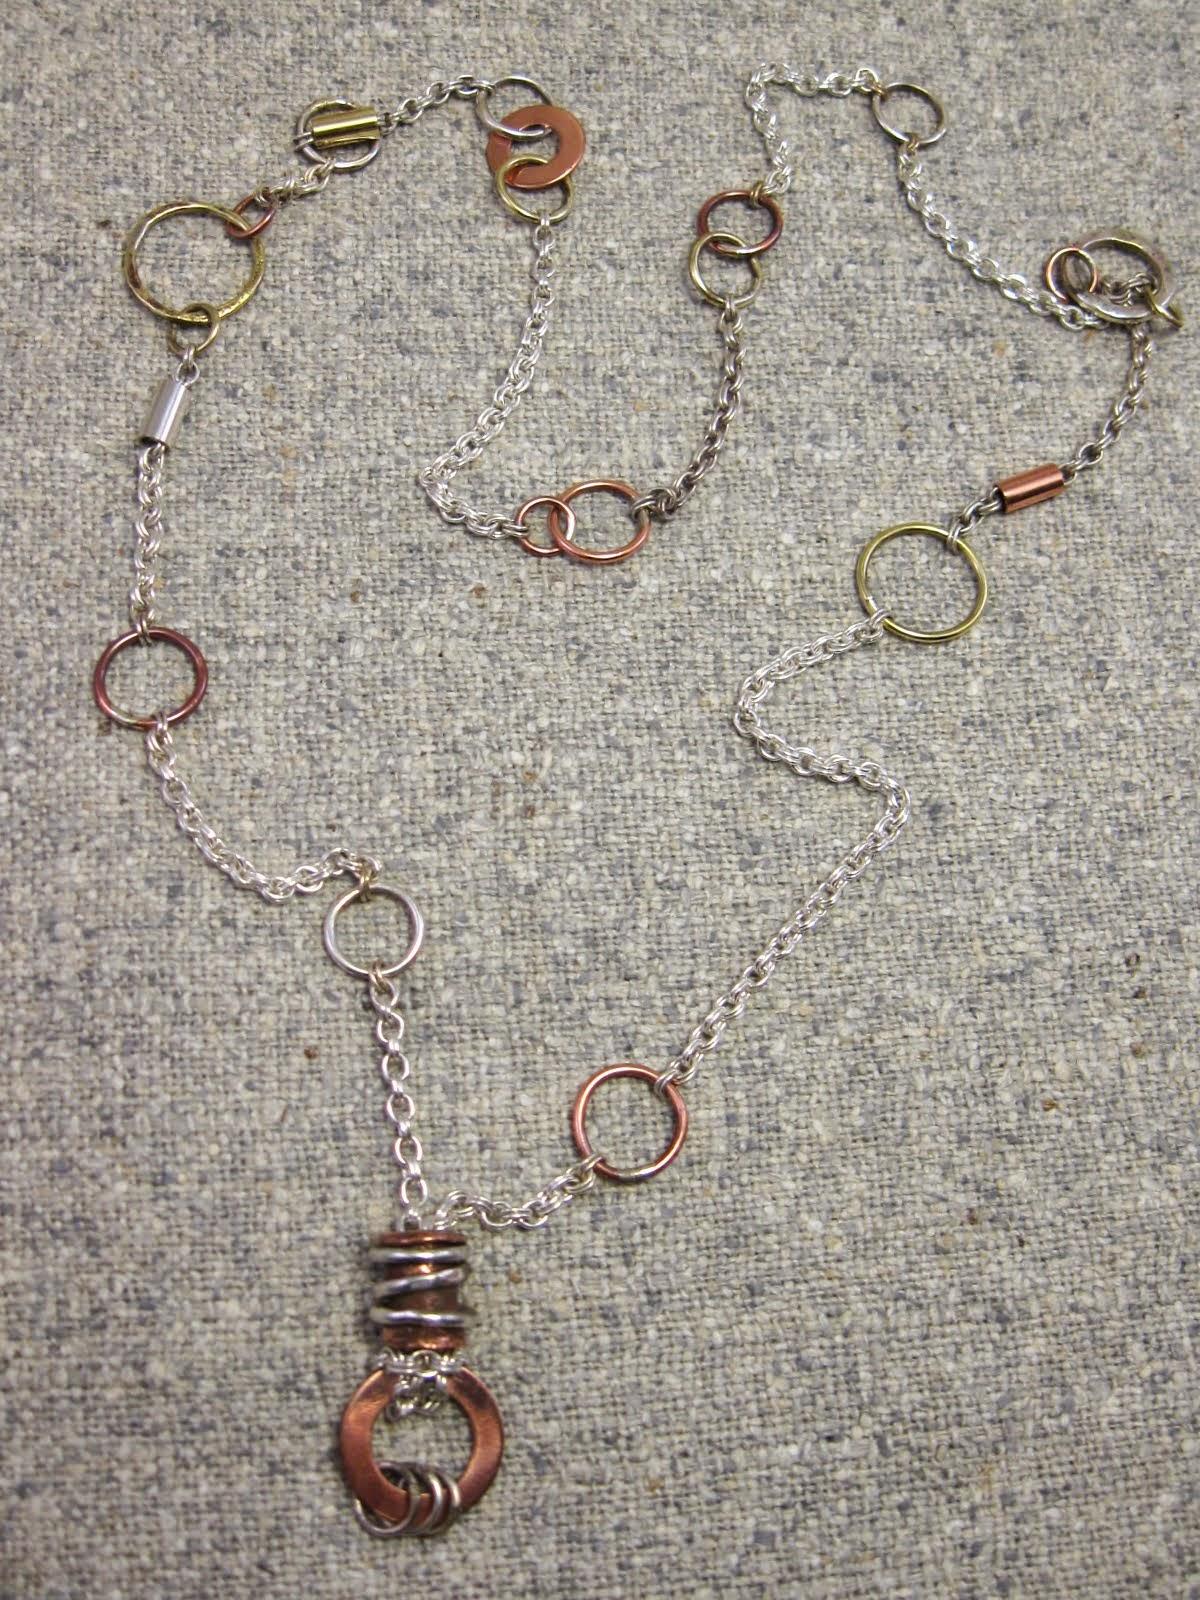 flanged tube chain.